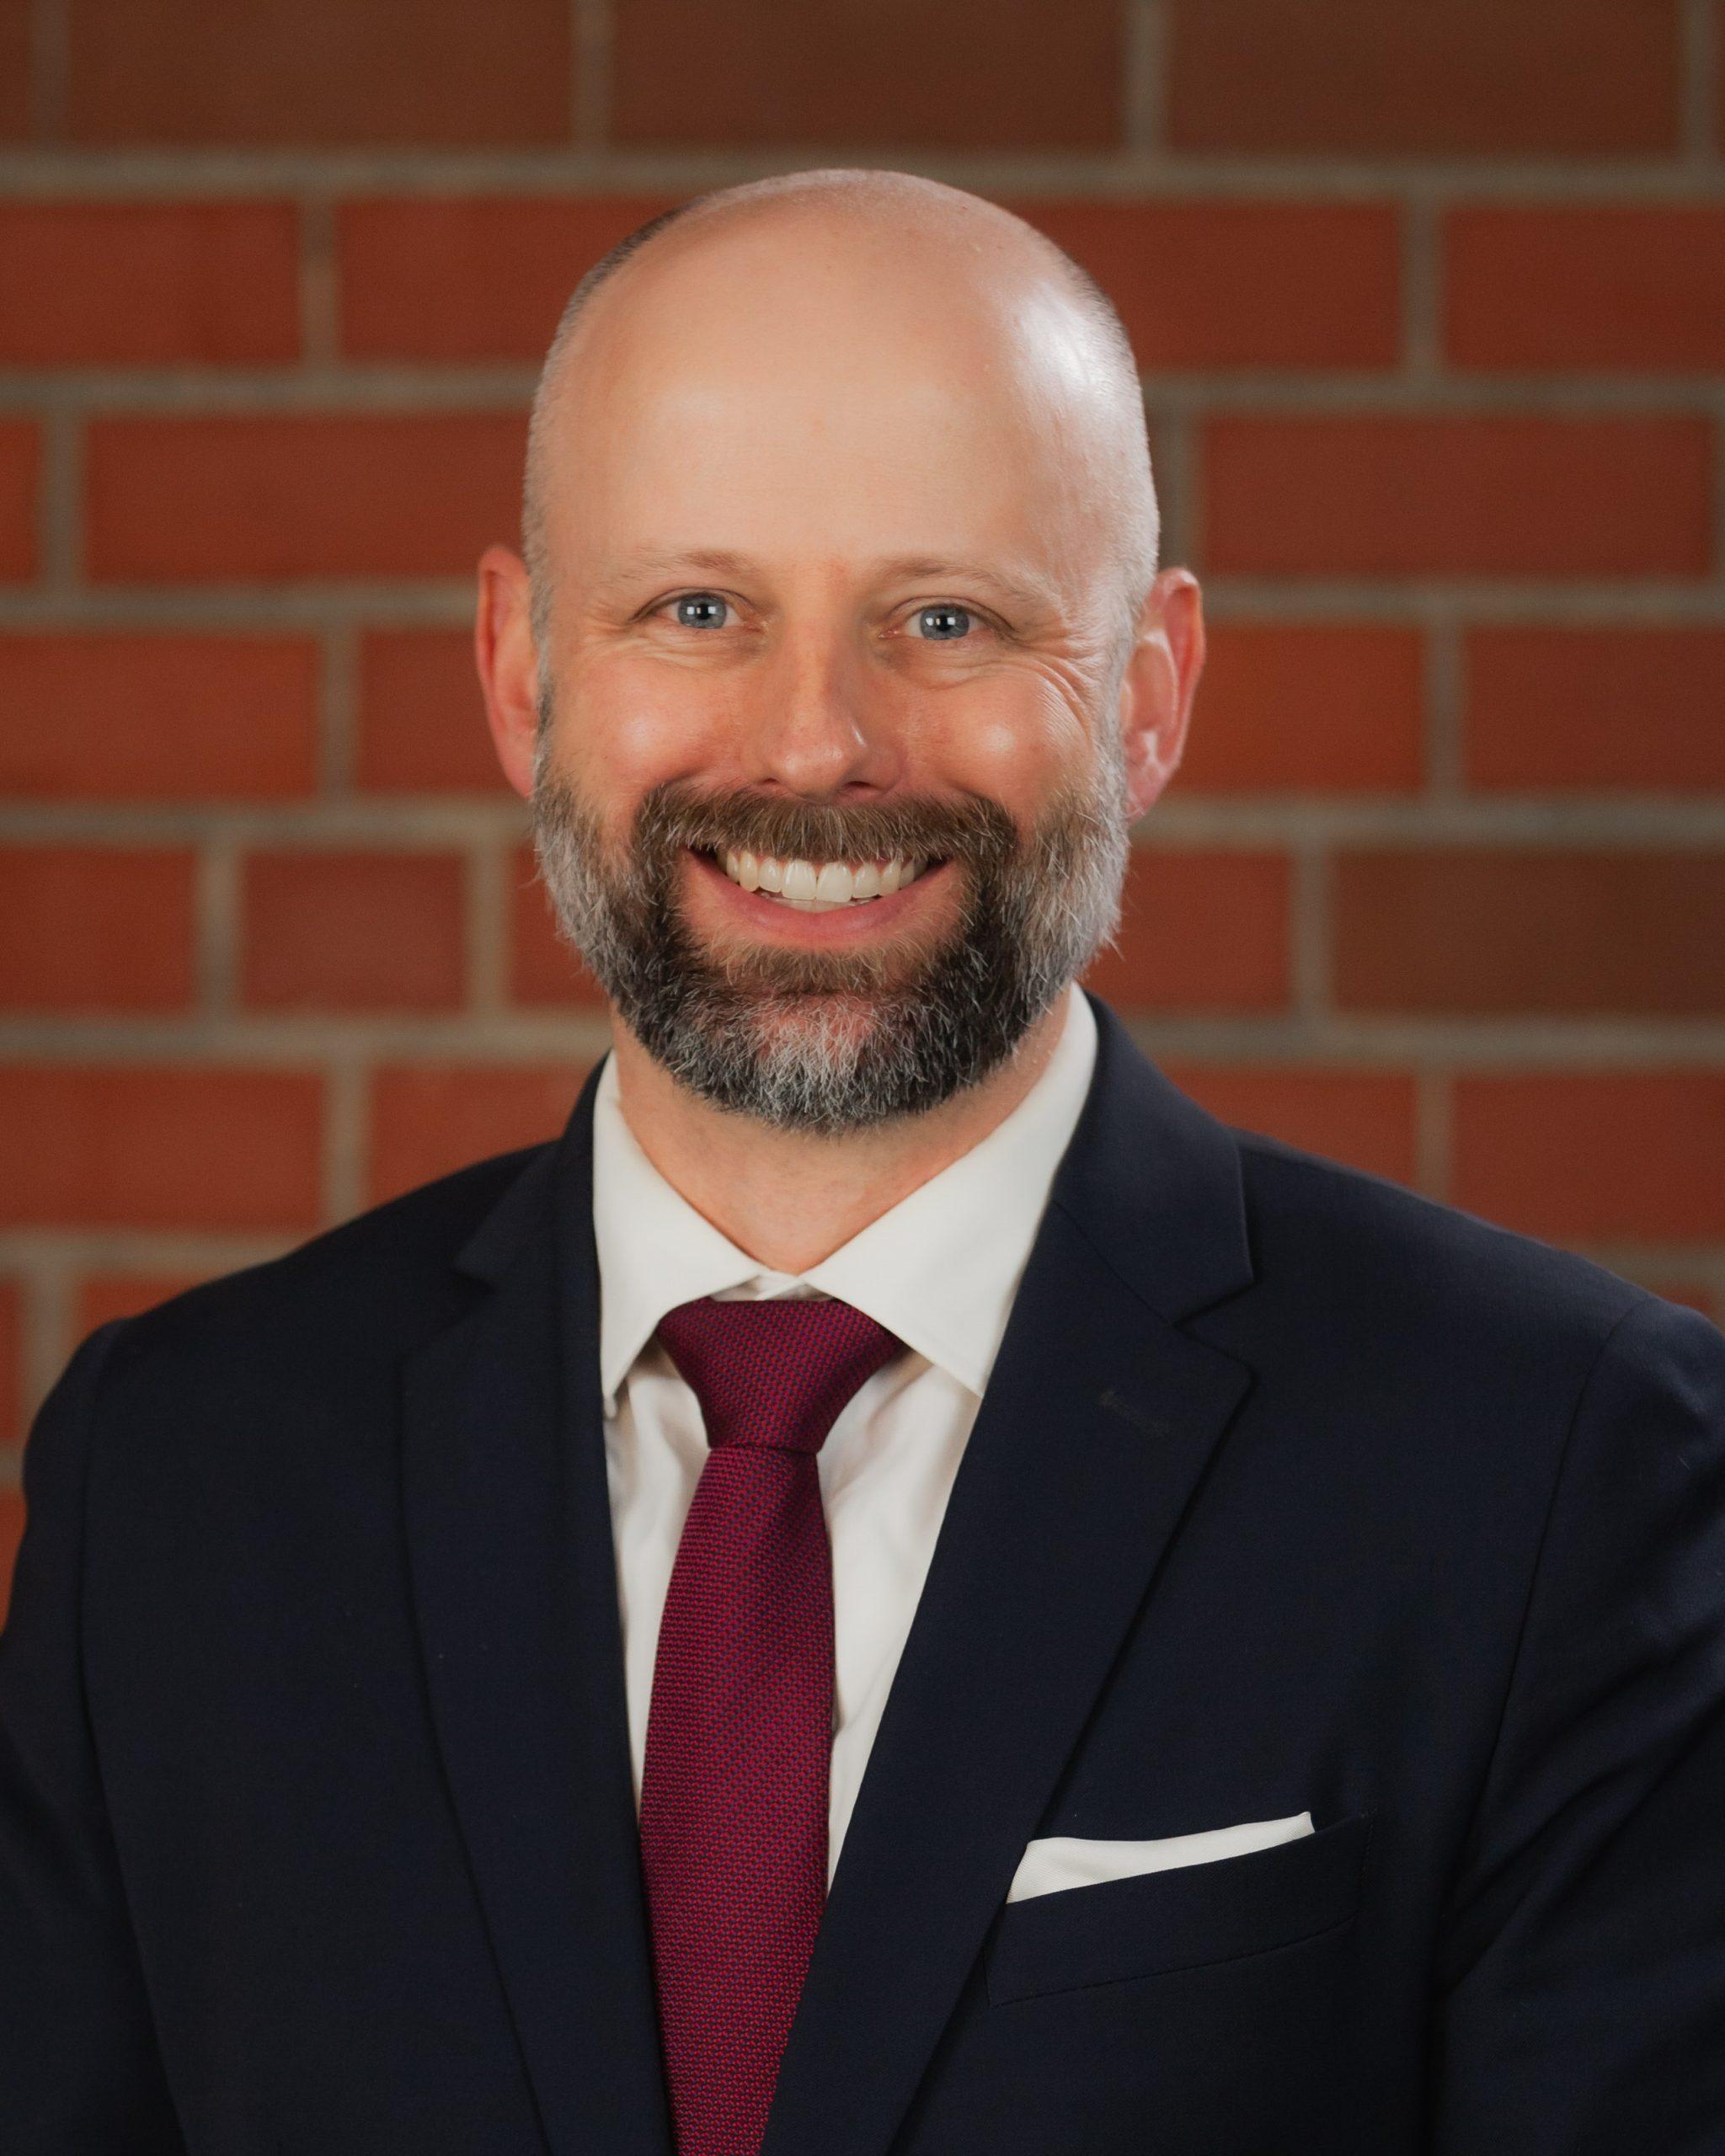 Image of Dr. Jonathan Manz